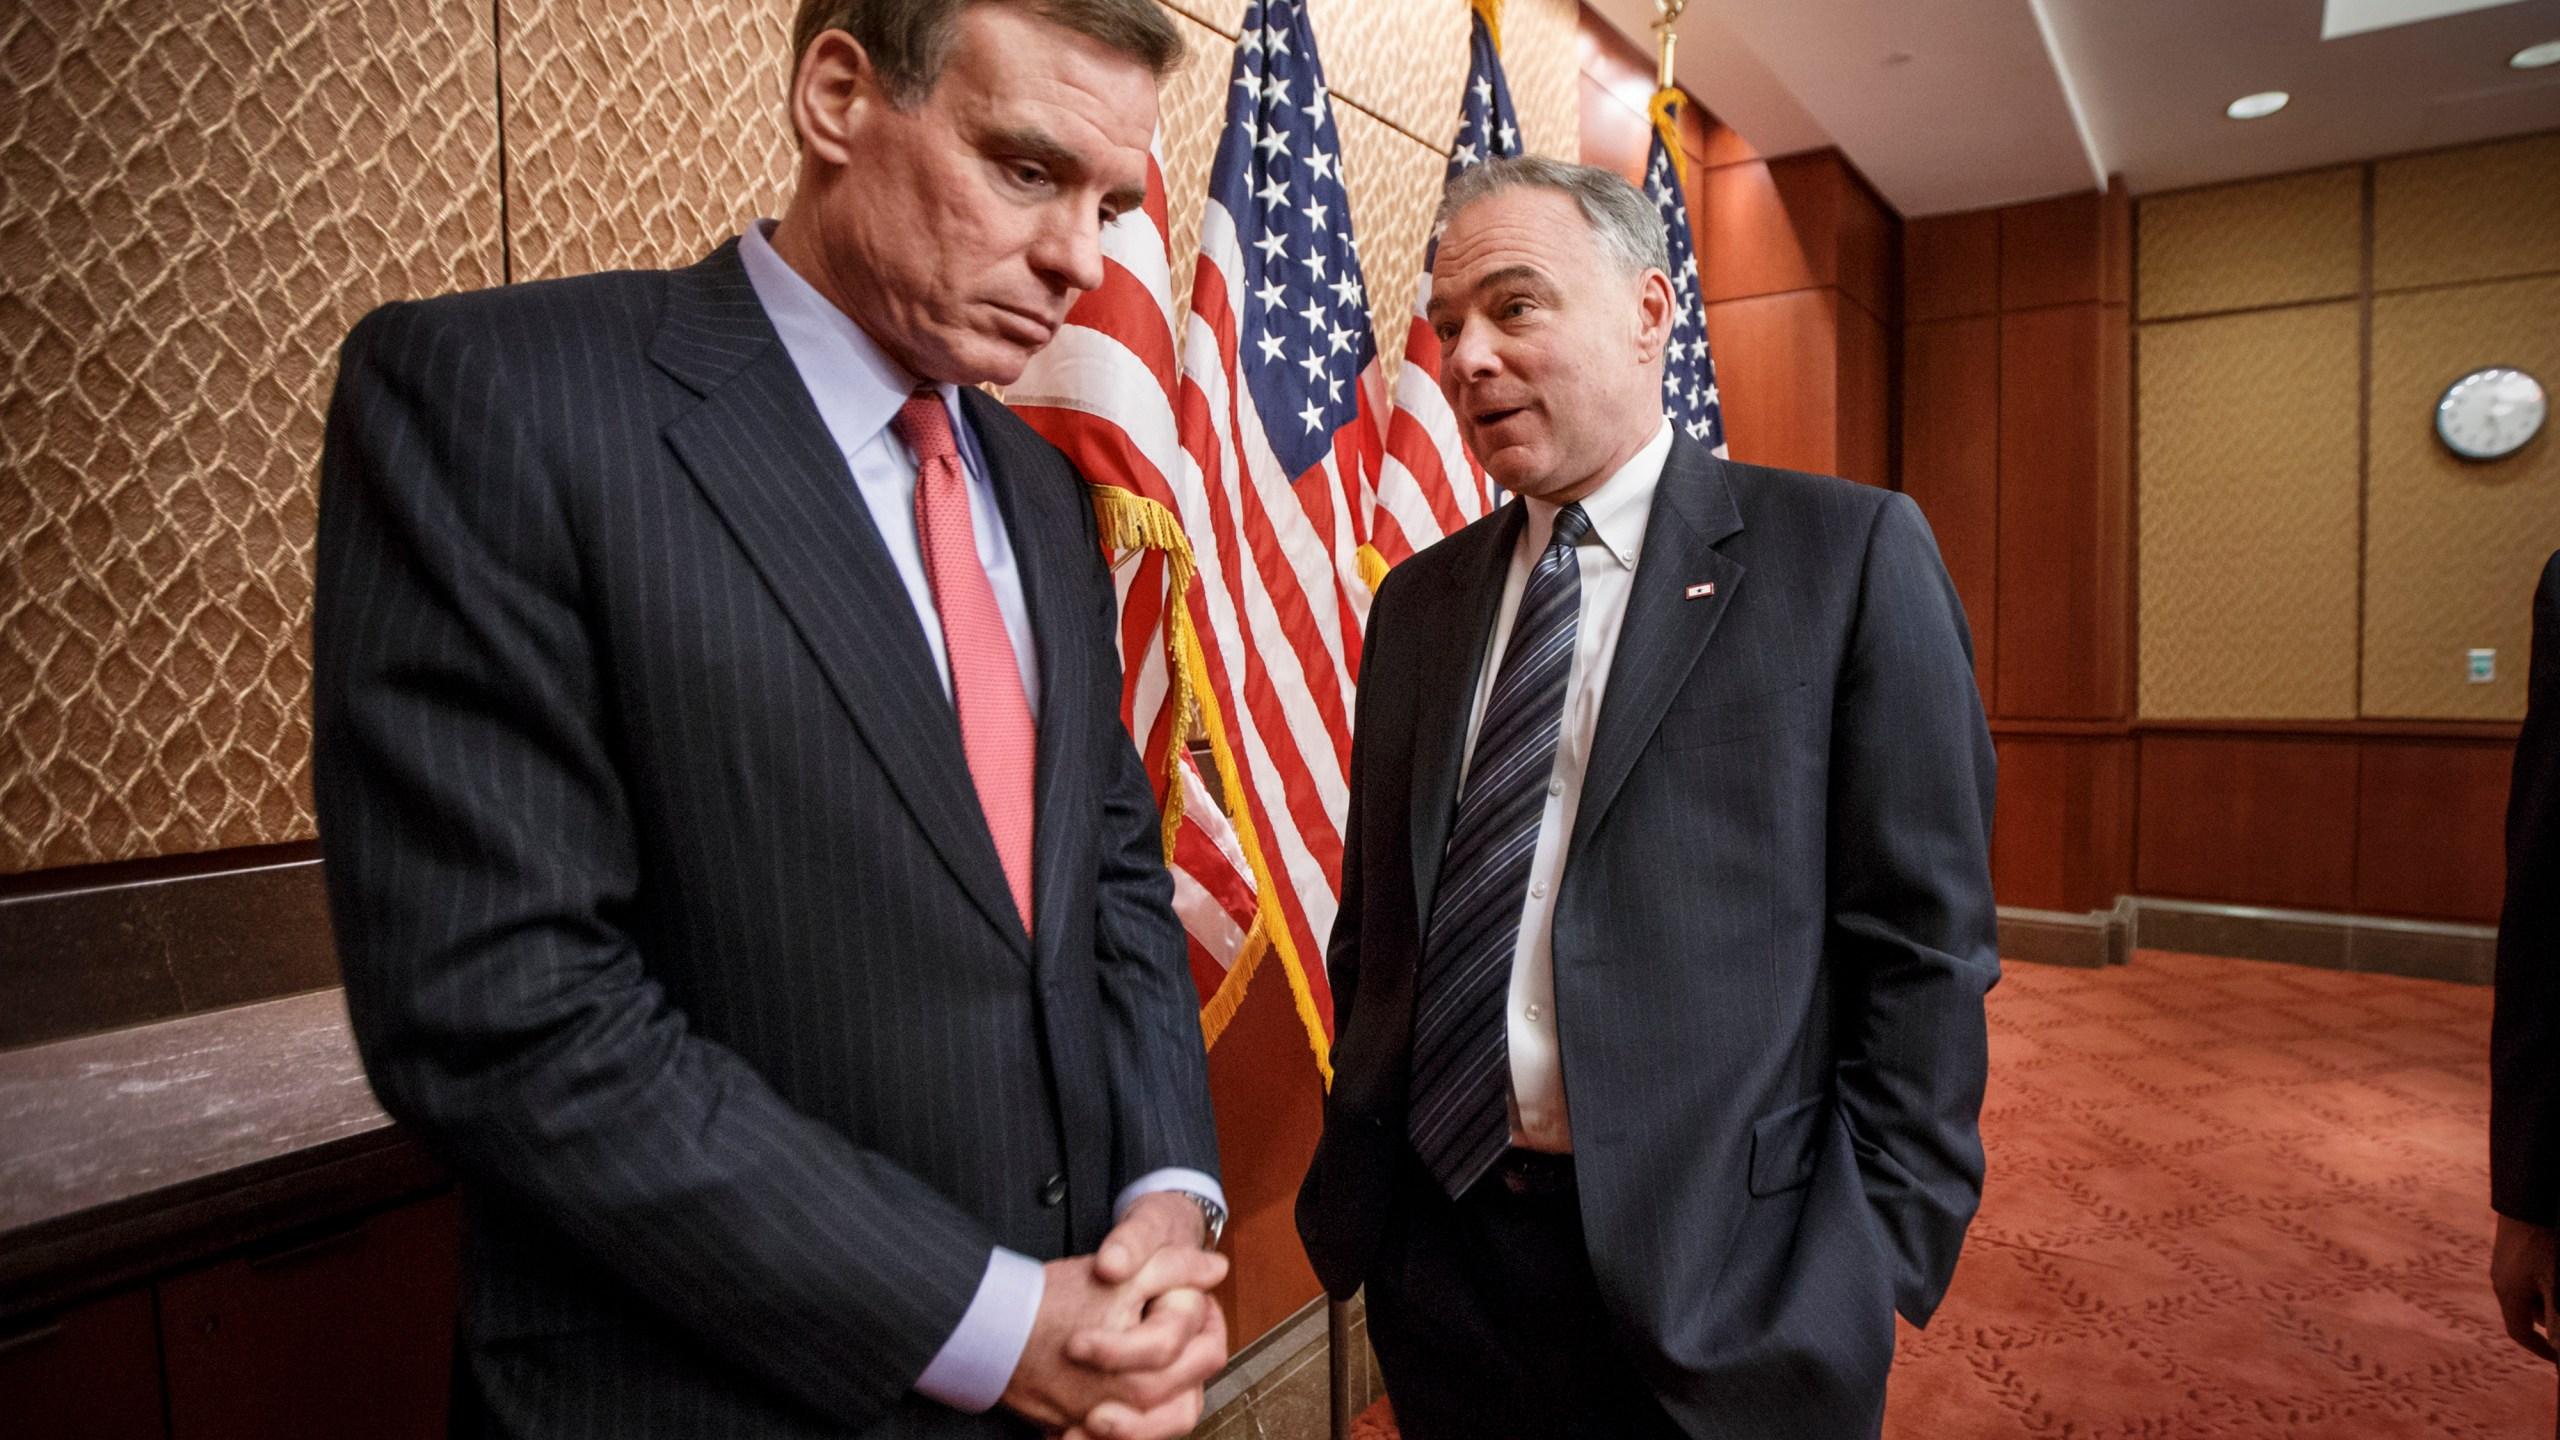 Mark Warner and Tim Kaine